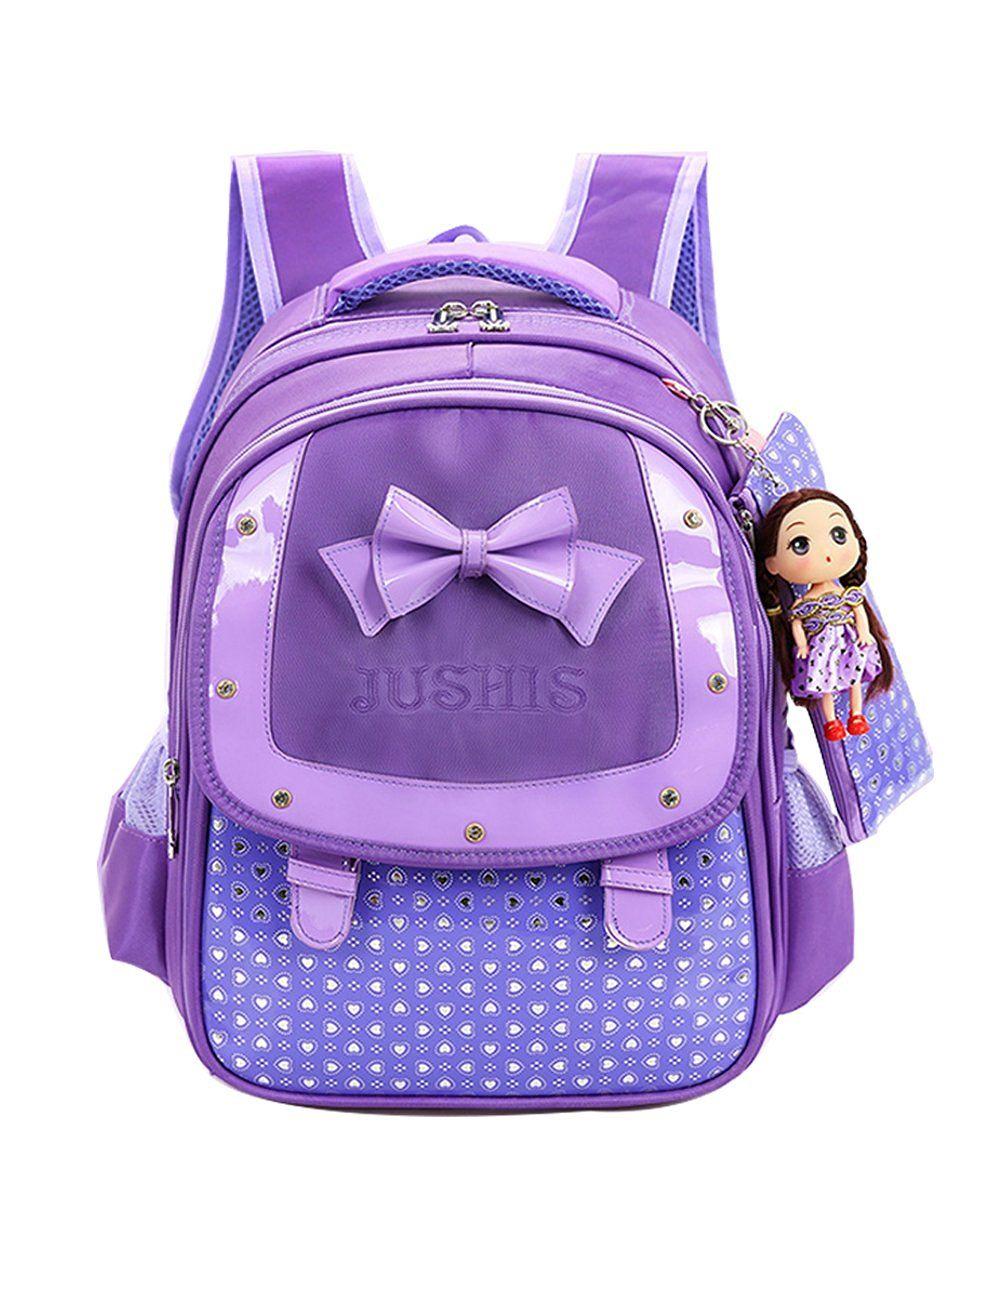 Childrens school bag primary school students 1-4 grade cartoon backpack